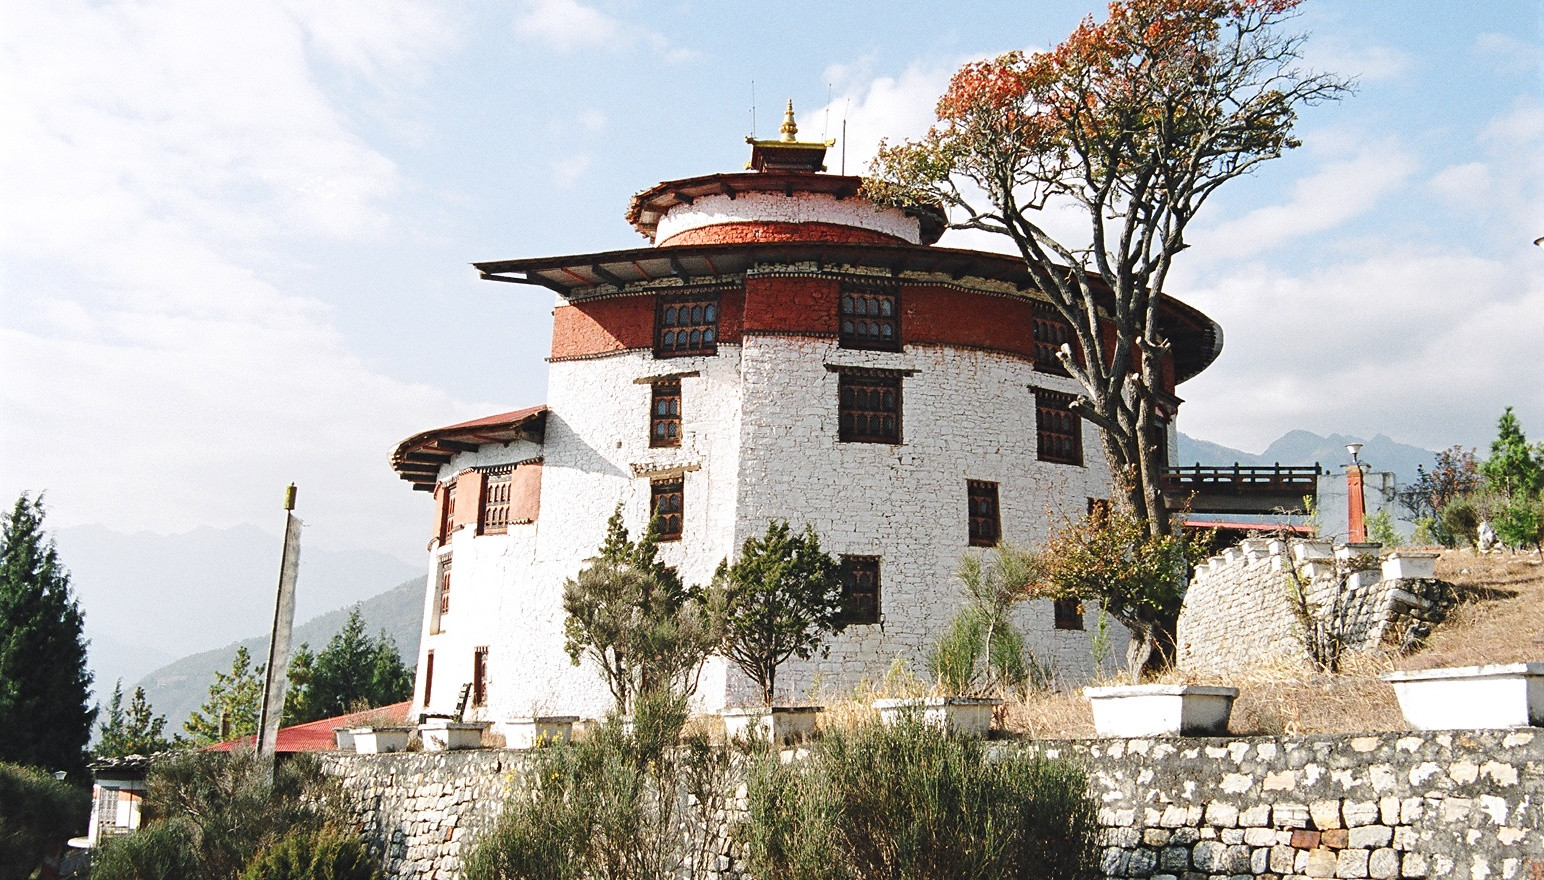 Ta-Dzong - National Musuem of Bhutan